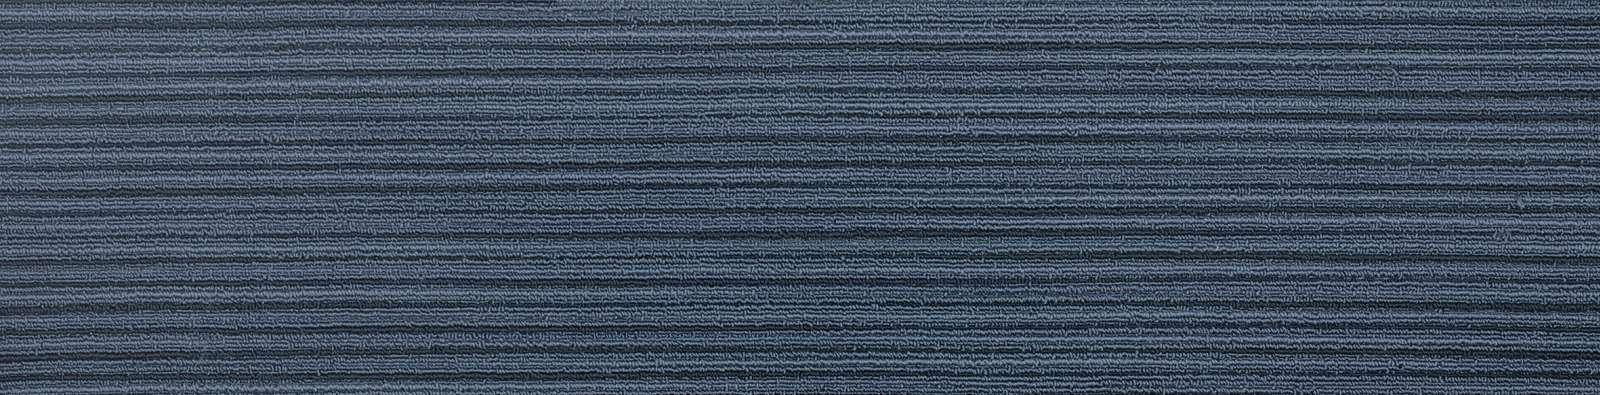 Teppichplanke im Maß 25x100